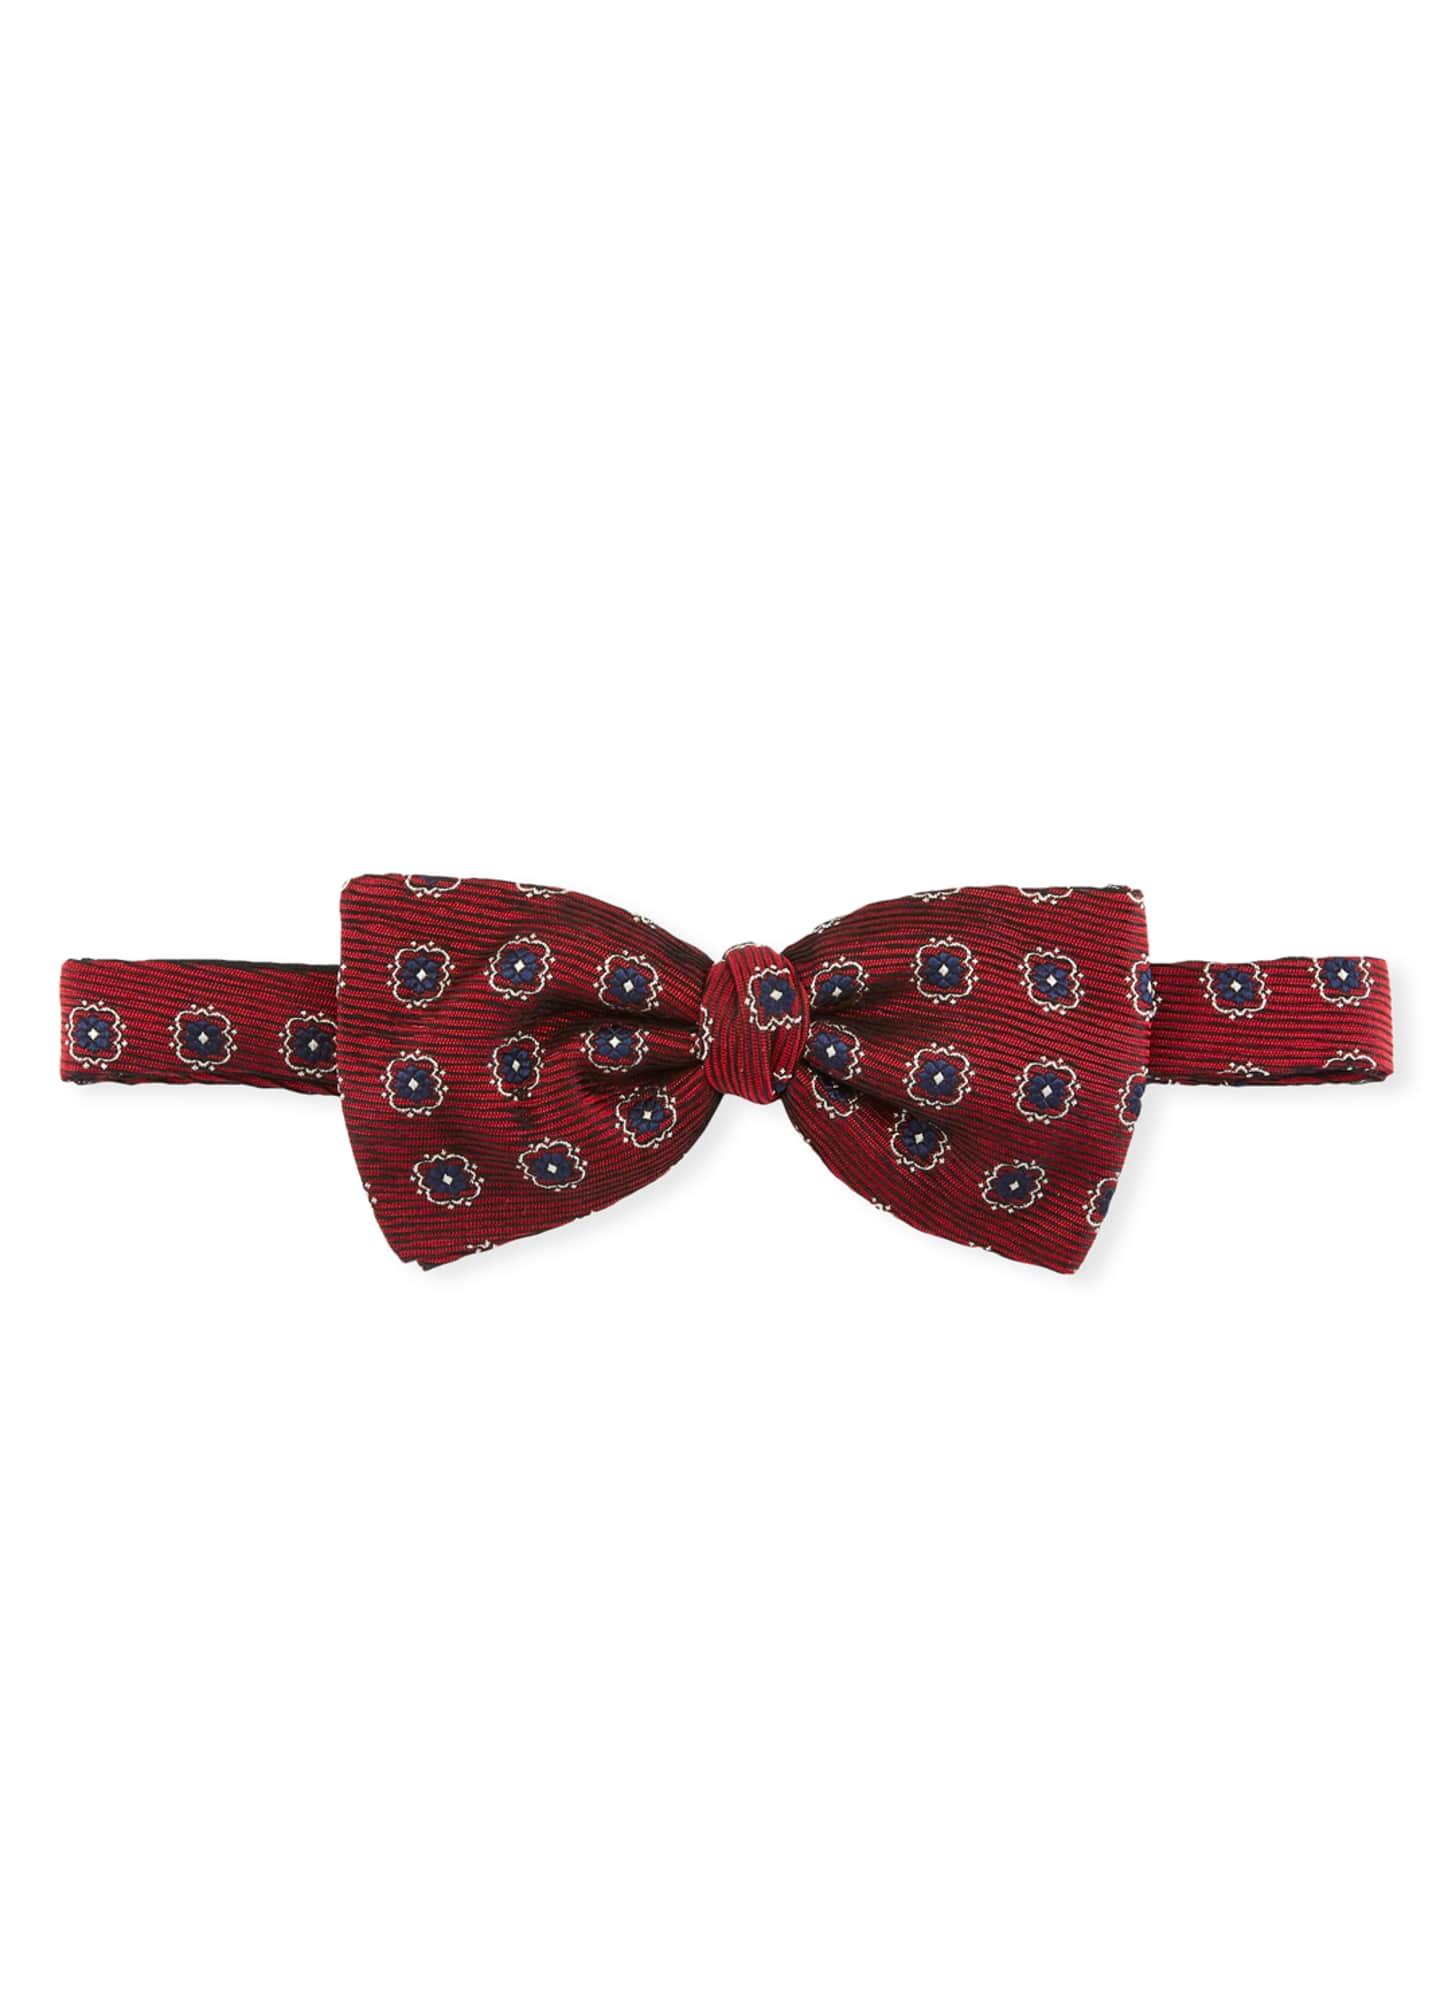 Ermenegildo Zegna Medallions Silk Bow Tie